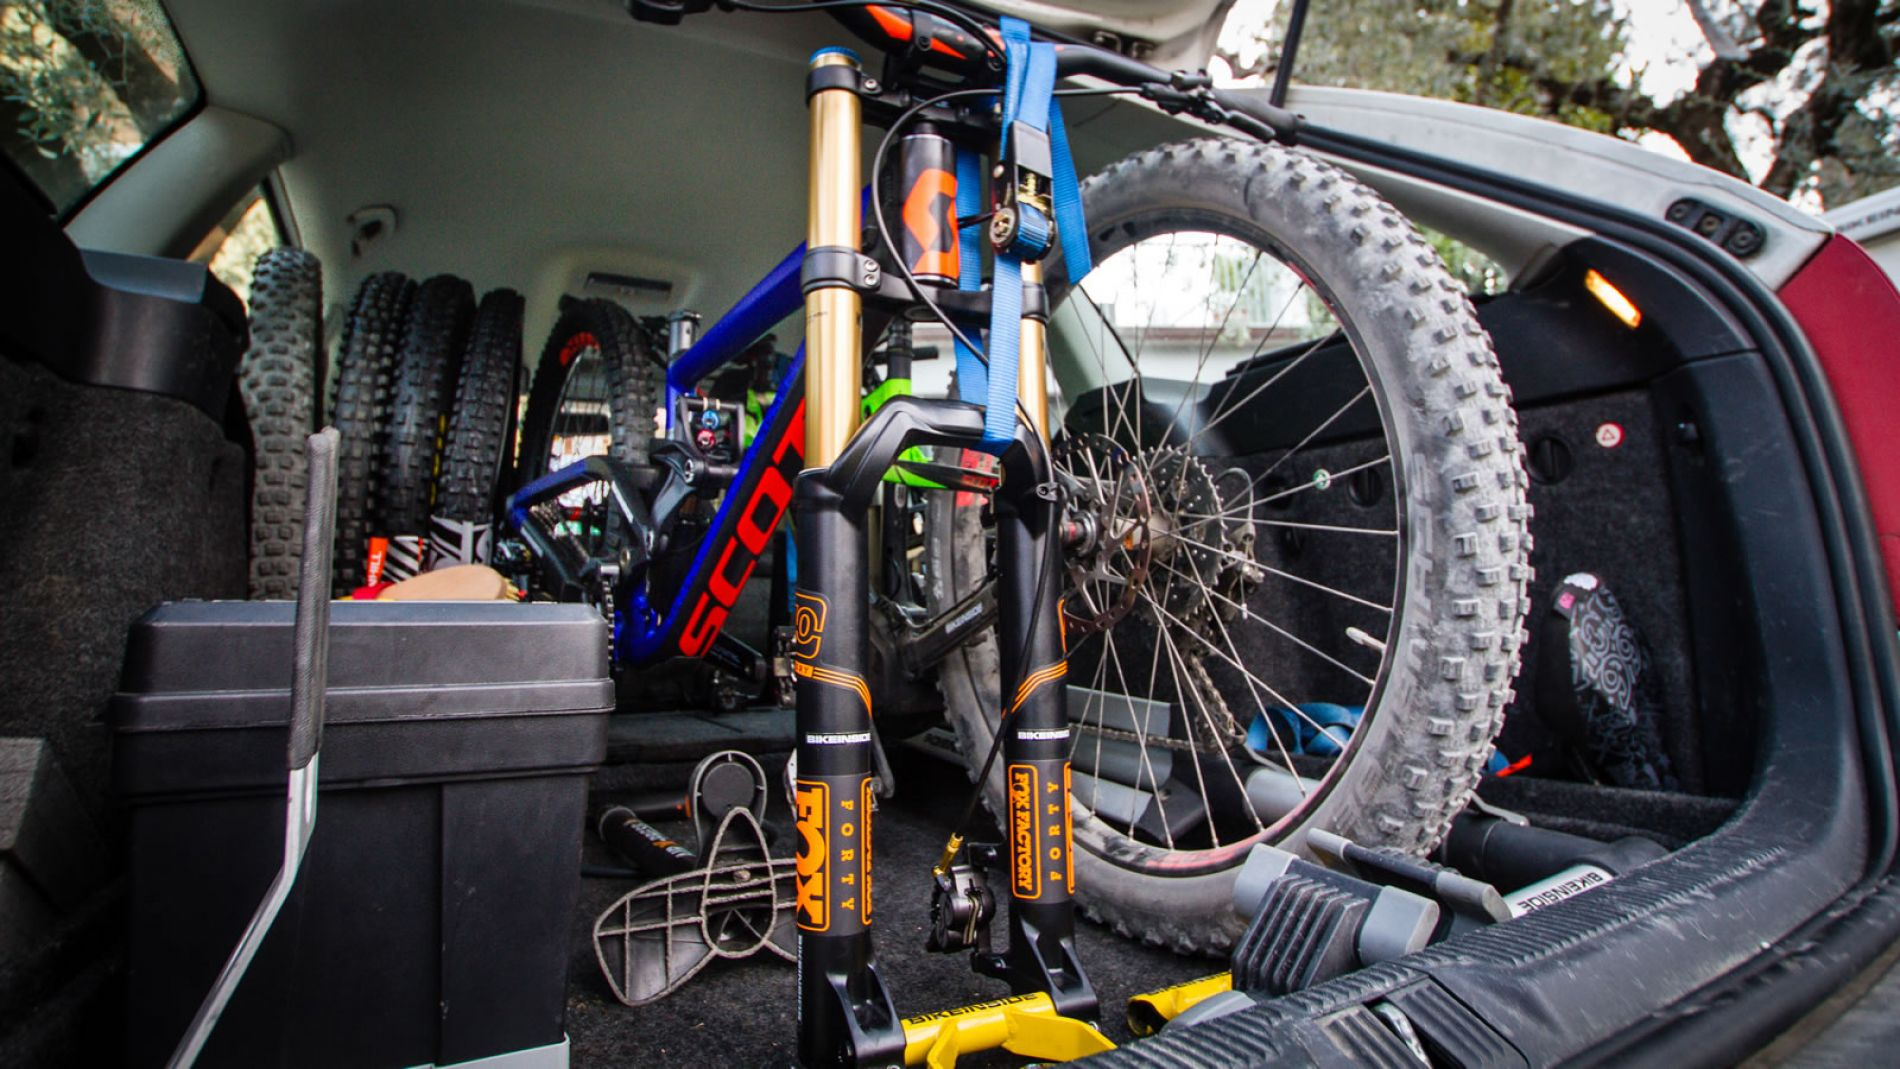 bikeinside innenraum fahrradtr ger fahrradtransport im. Black Bedroom Furniture Sets. Home Design Ideas